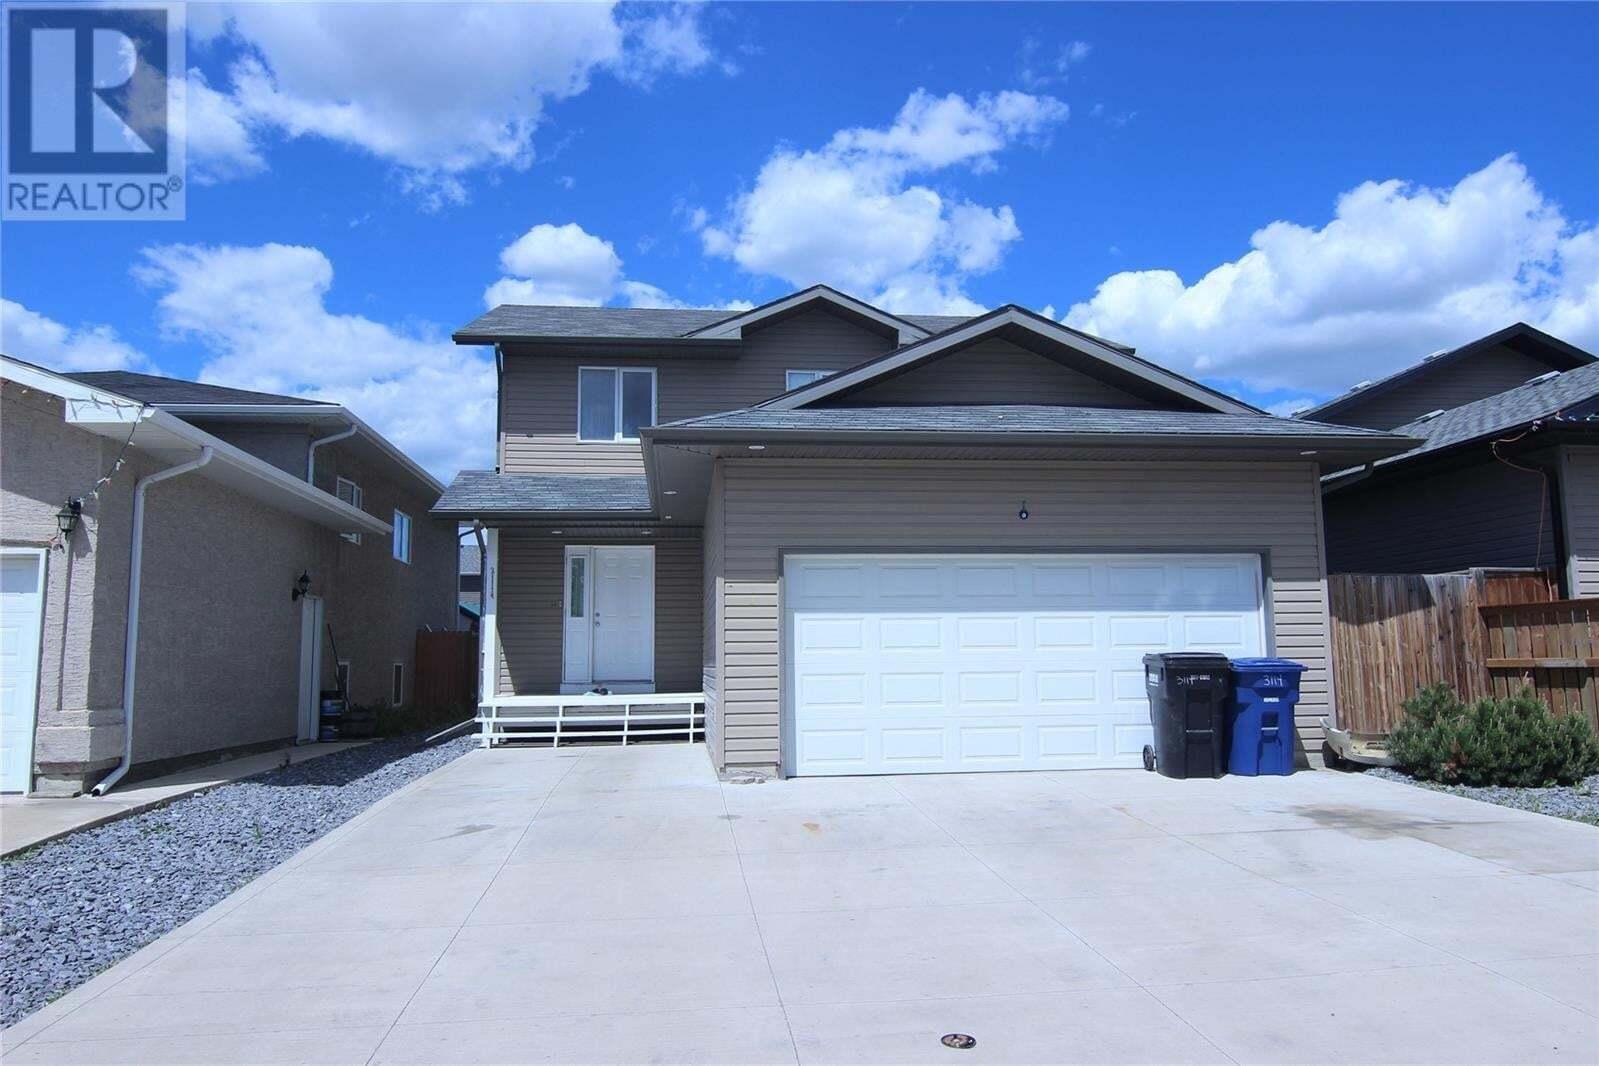 House for sale at 3114 37th St W Saskatoon Saskatchewan - MLS: SK810732